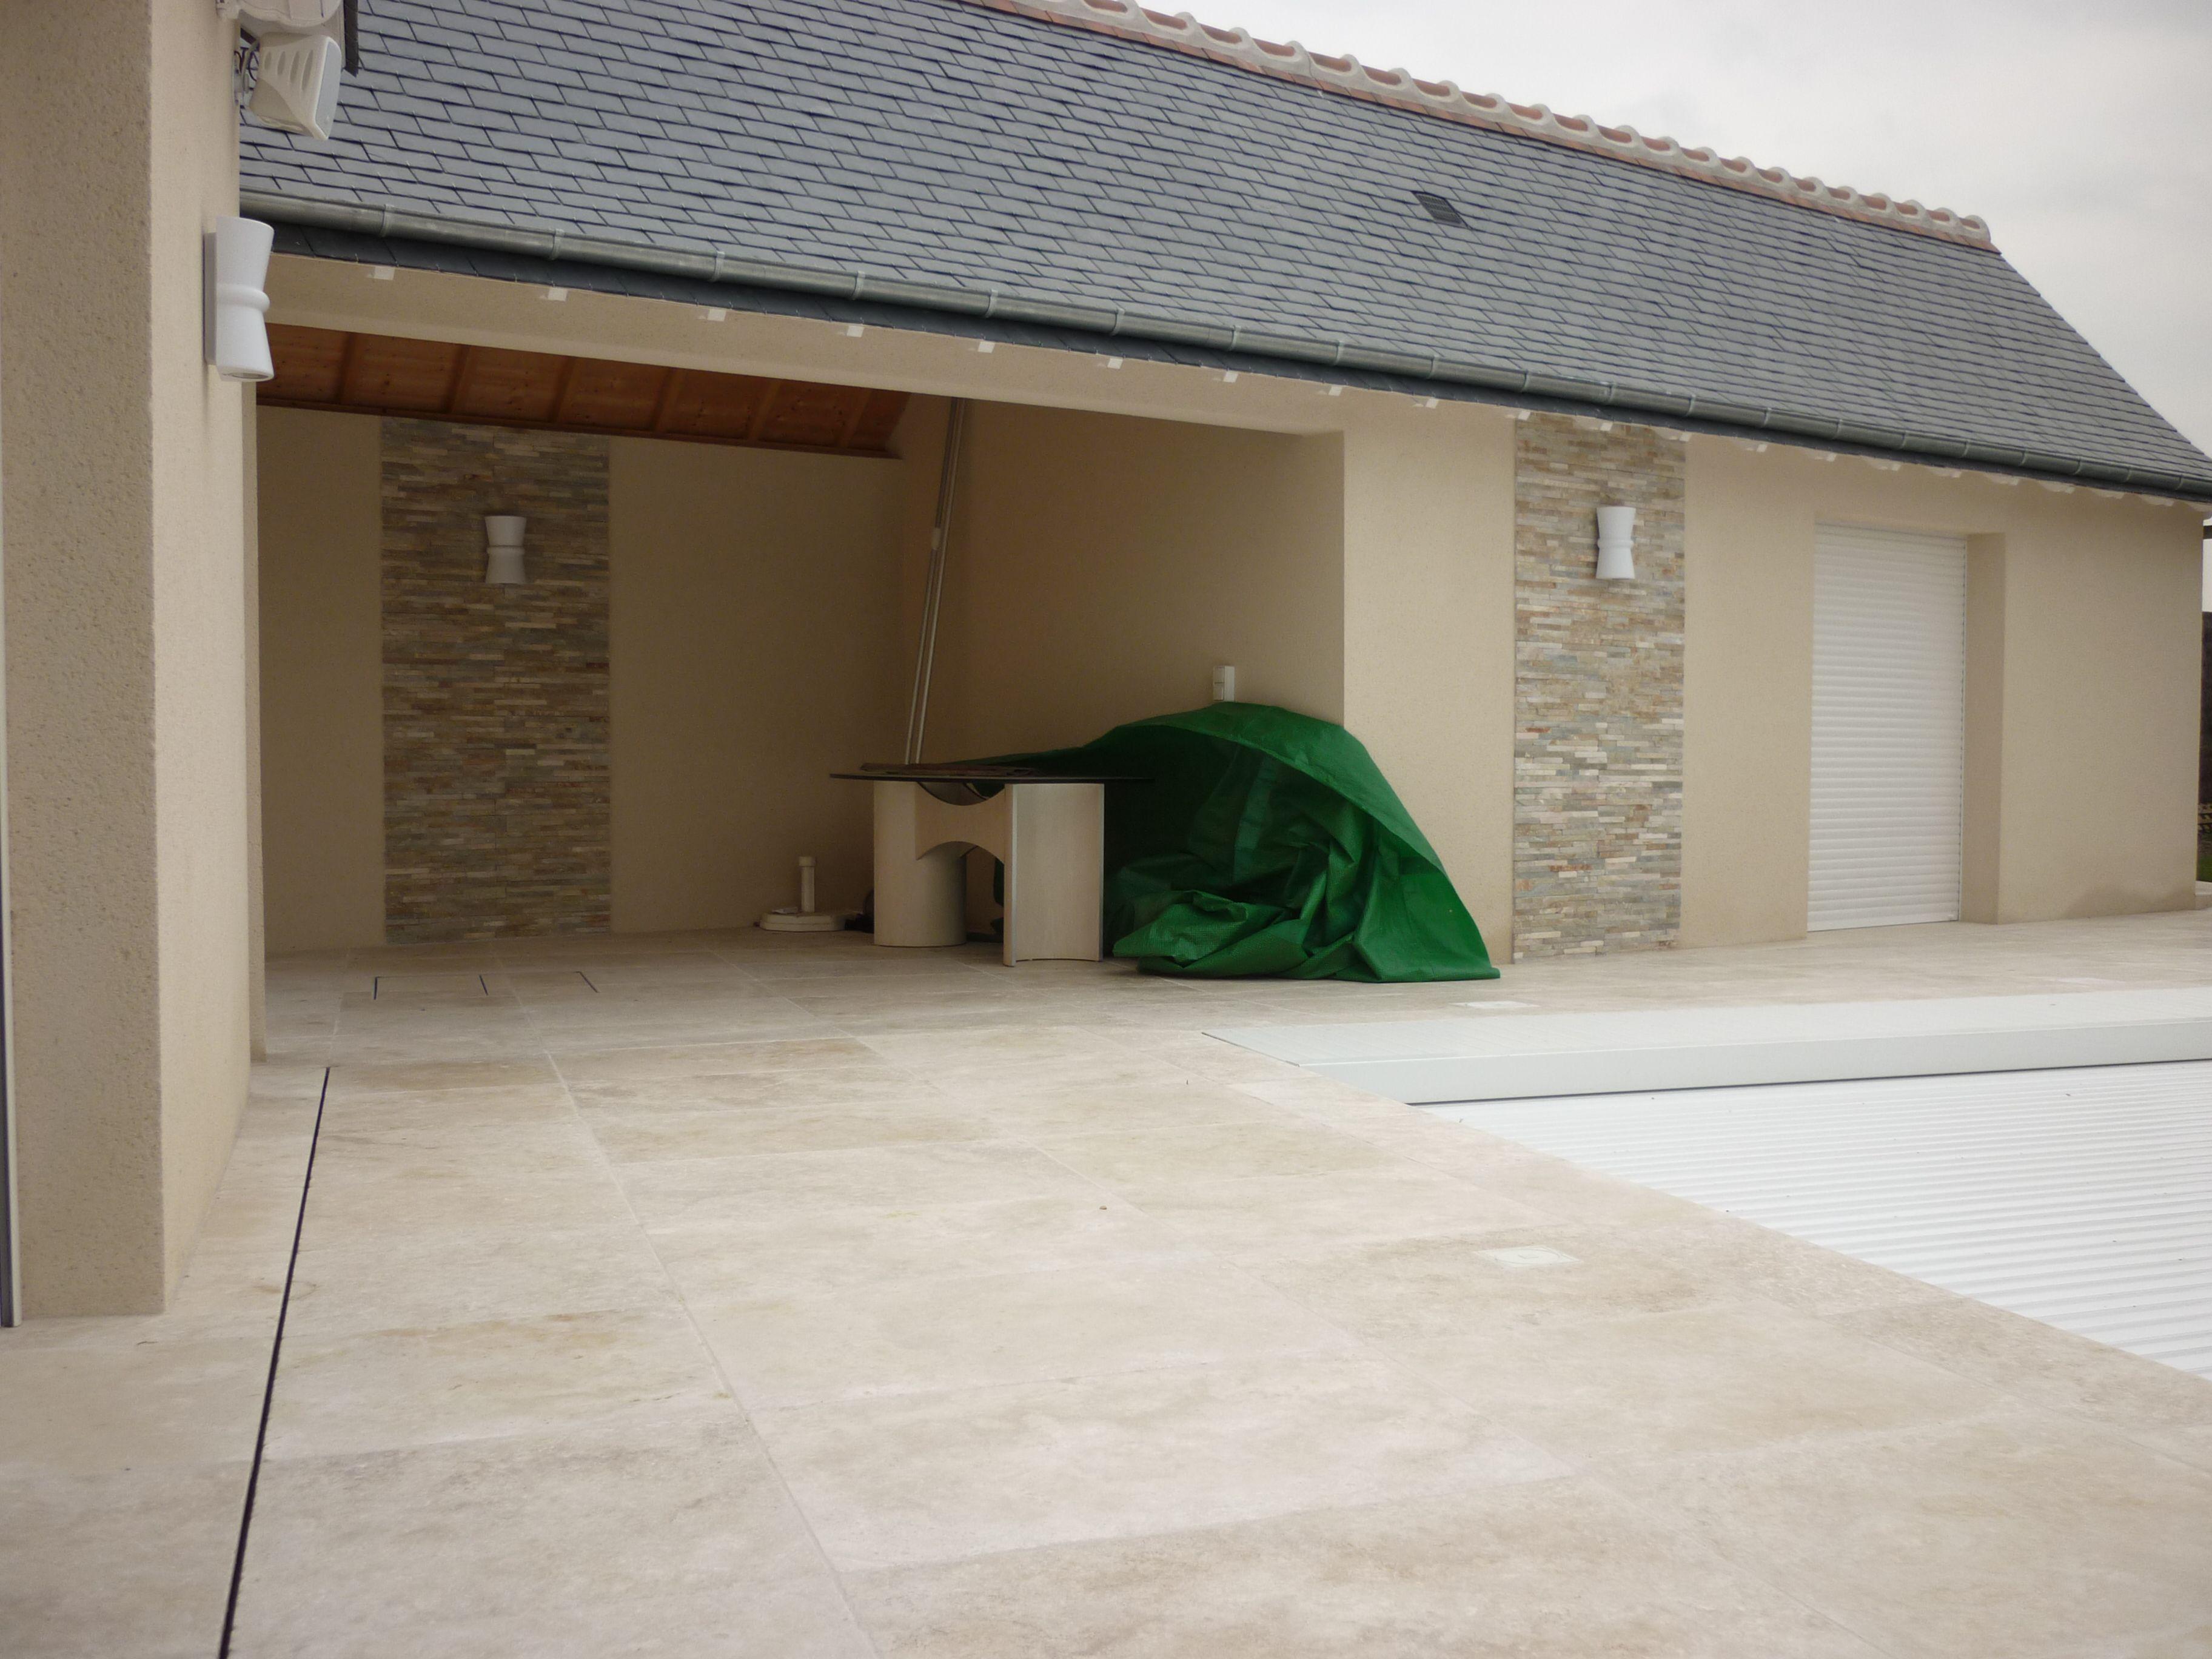 Marmol travertino avellana nuevos formatos para bordes de - Pavimentos de marmol ...